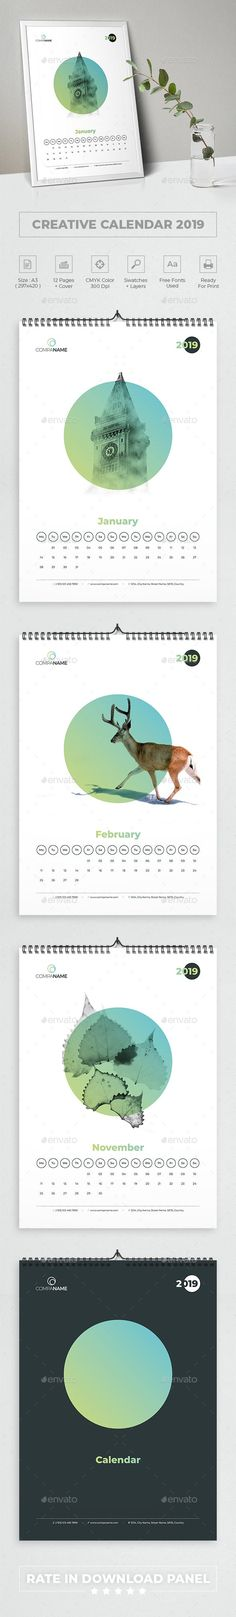 #Creative #Calendar 2019 - #Calendars Stationery Office Calendar, Calendar 2018, Desk Calendars, Business Calendar, Creative Calendar, Cleaning Walls, Anime Artwork, Marketing, Deco